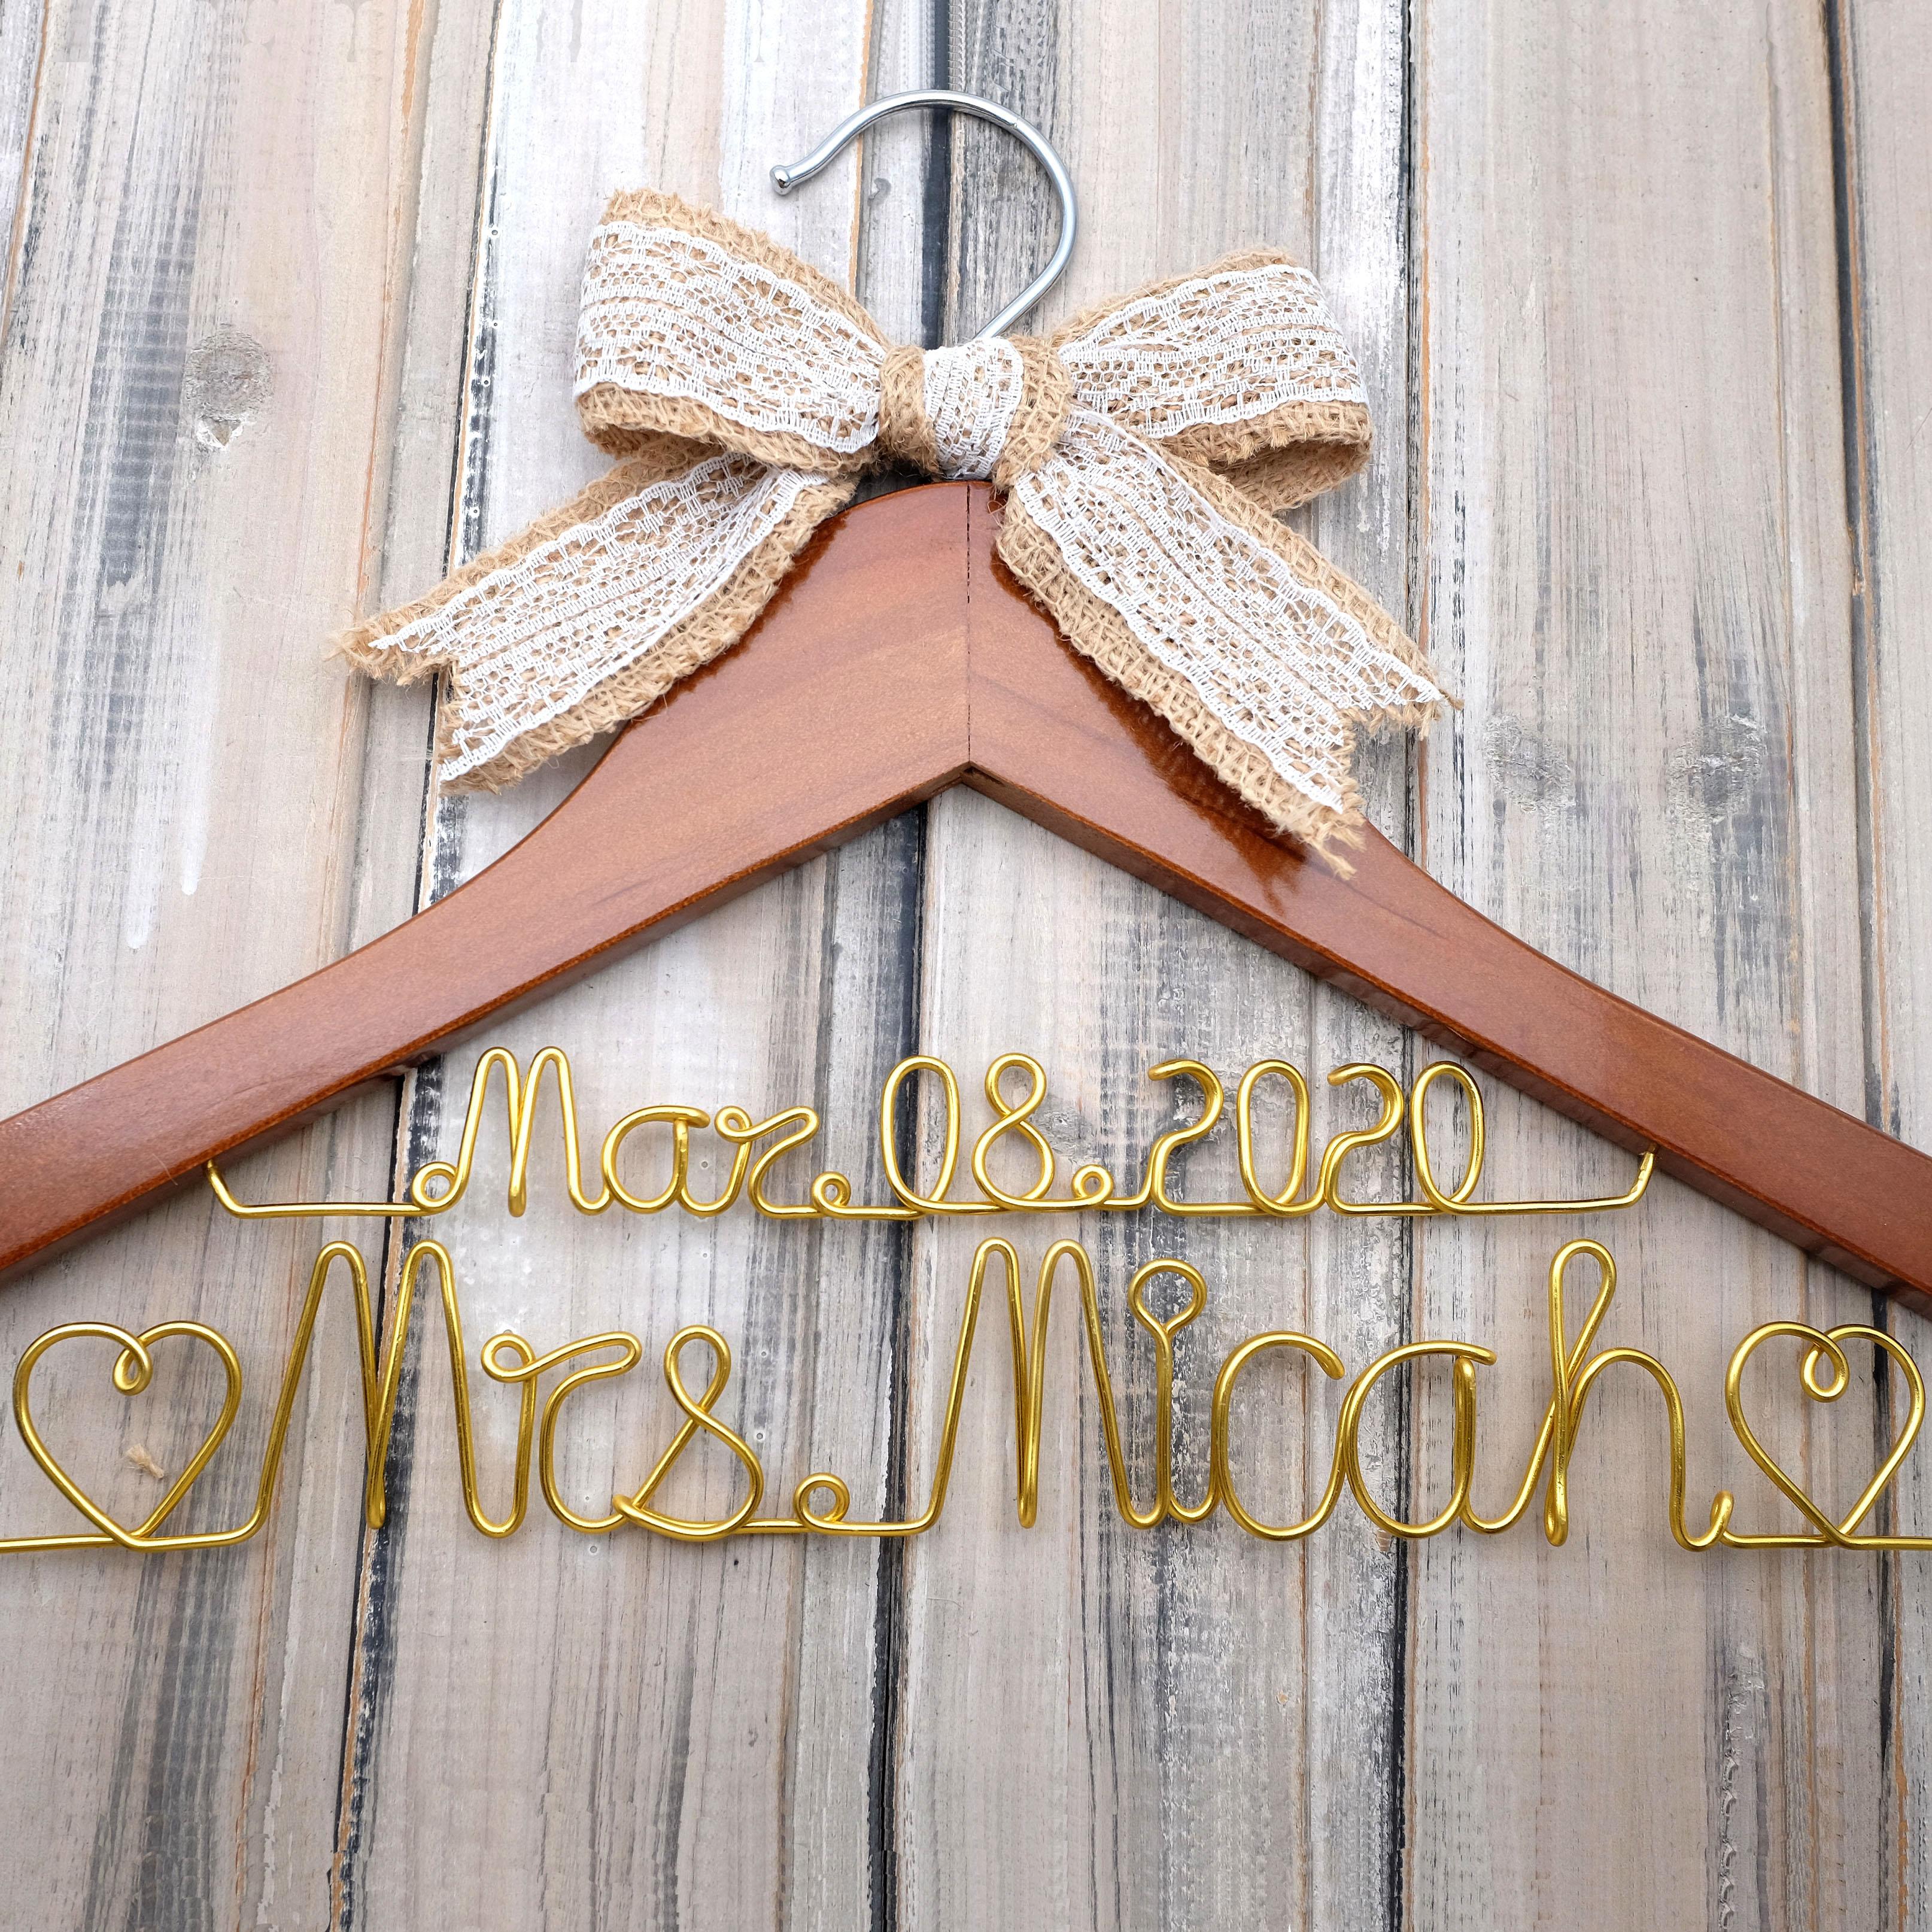 Custom Wedding Hanger,Wedding Dress Hanger,Bride Hanger,Double Line Wire Name Hanger ,Bridesmaid Hanger,Bridal Party Gifts